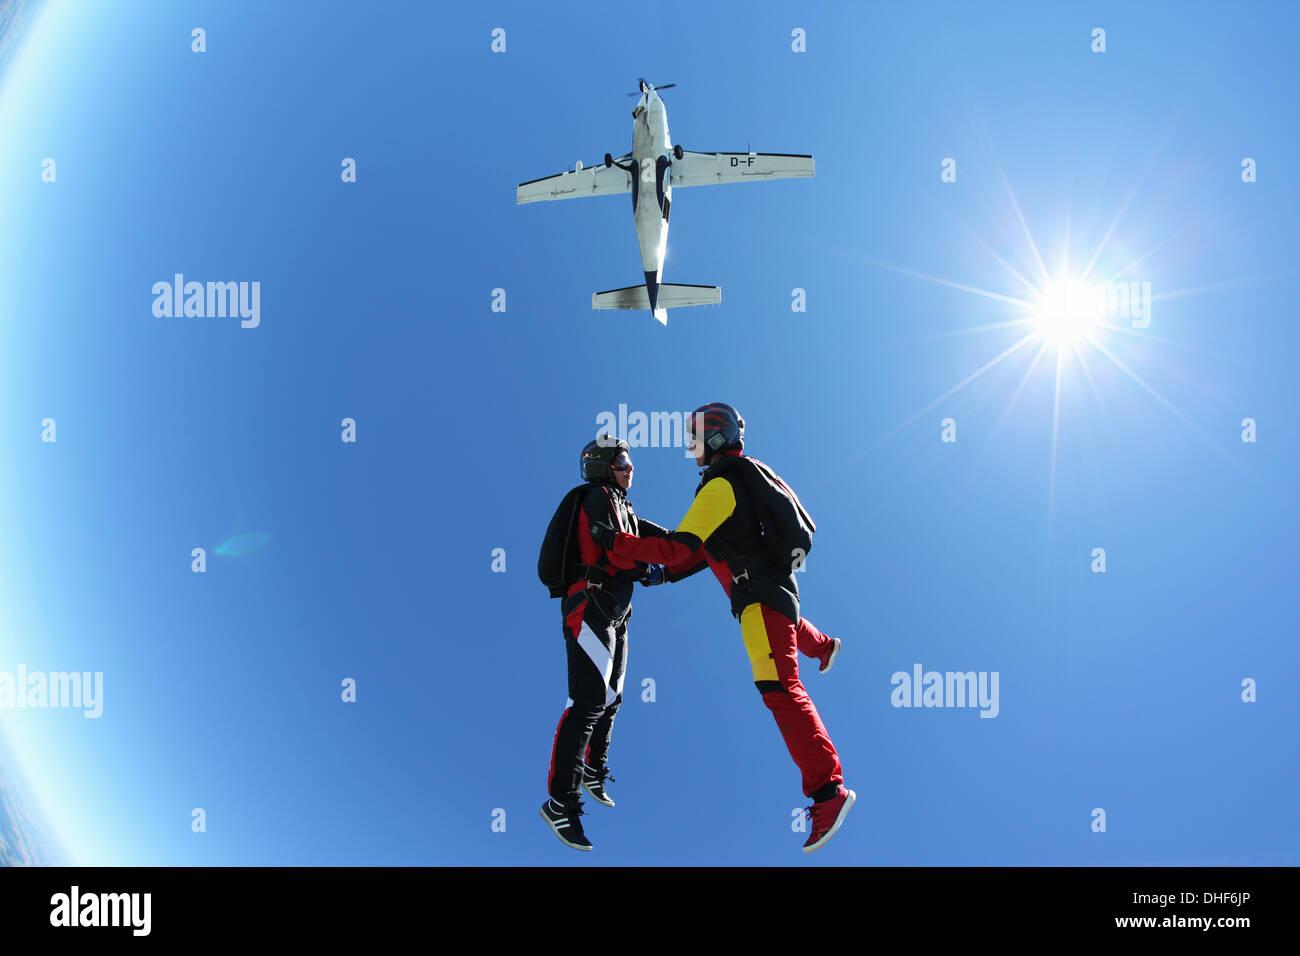 Female skydivers free falling above Leutkirch, Bavaria, Germany - Stock Image